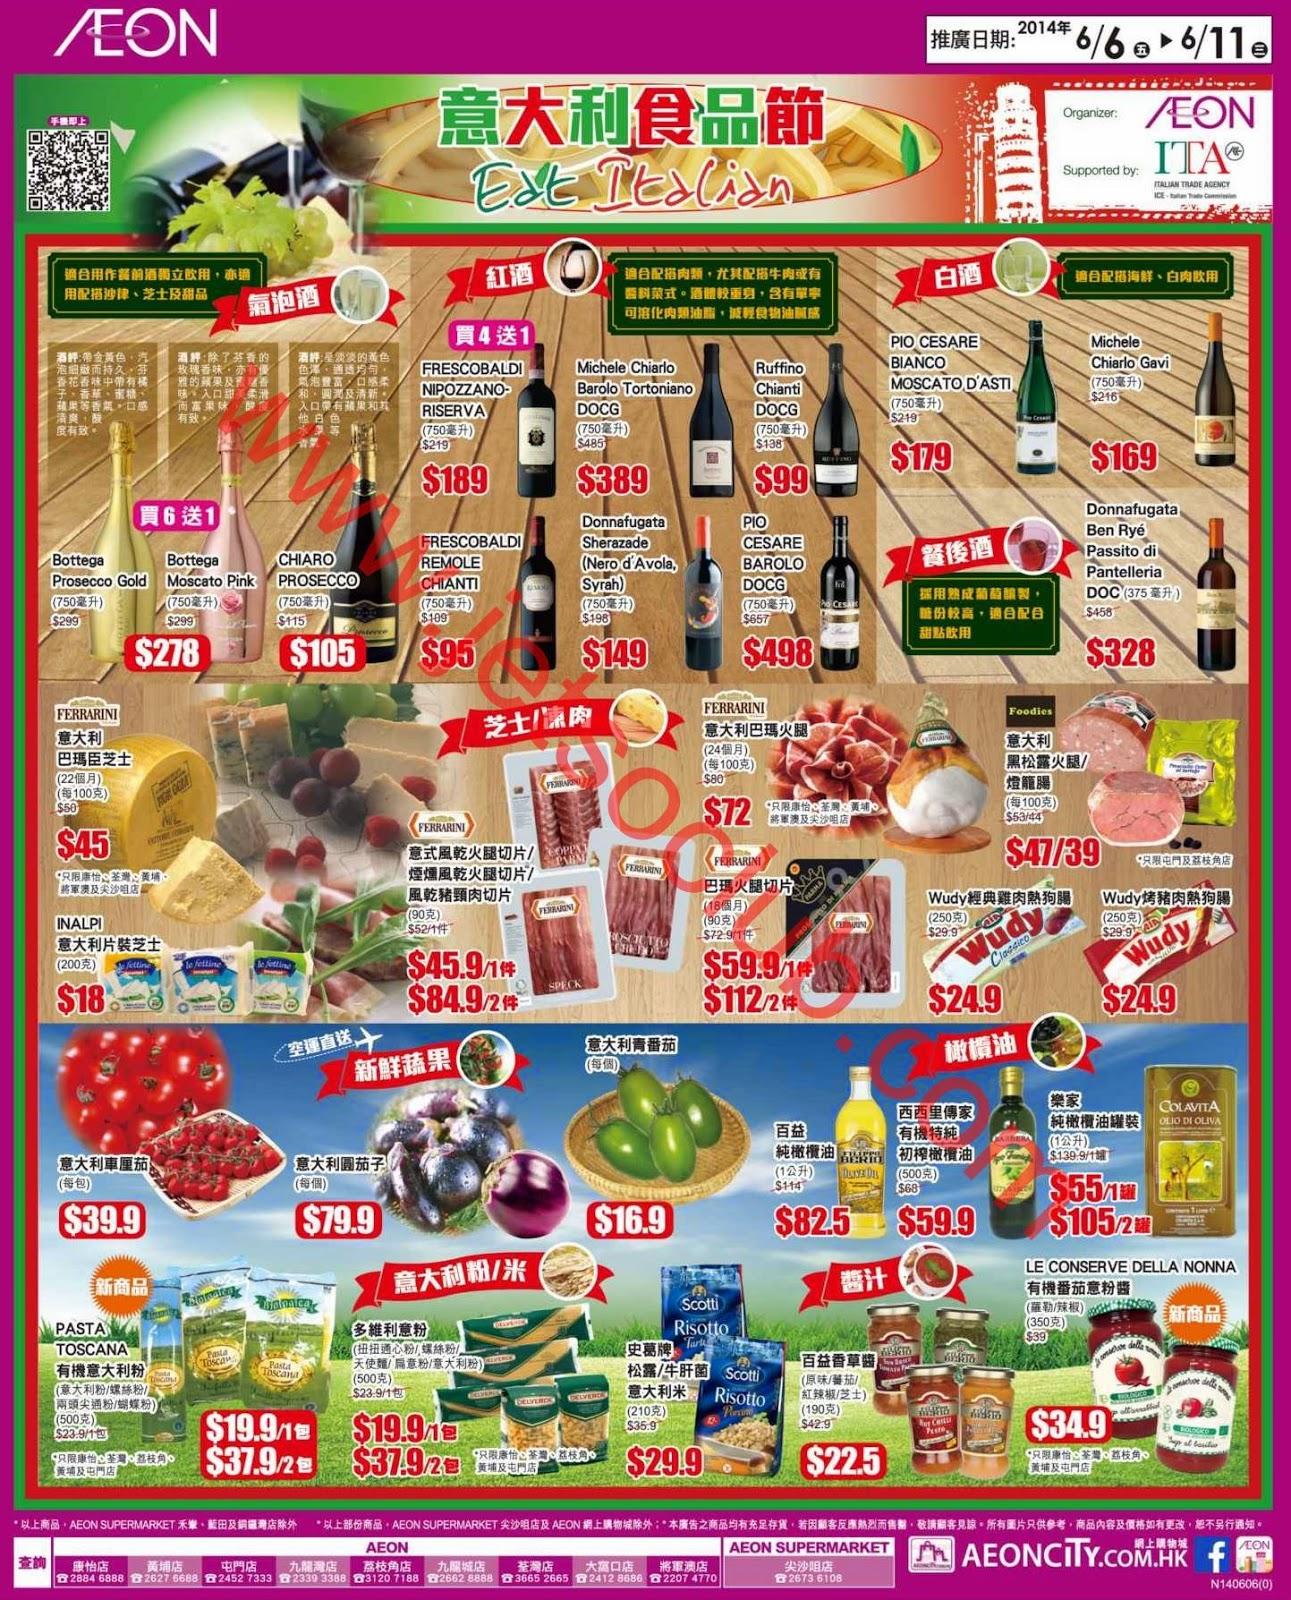 AEON:義大利食品節(6-11/6)/ 週末勁減(6-8/6) ( Jetso Club 著數俱樂部 )